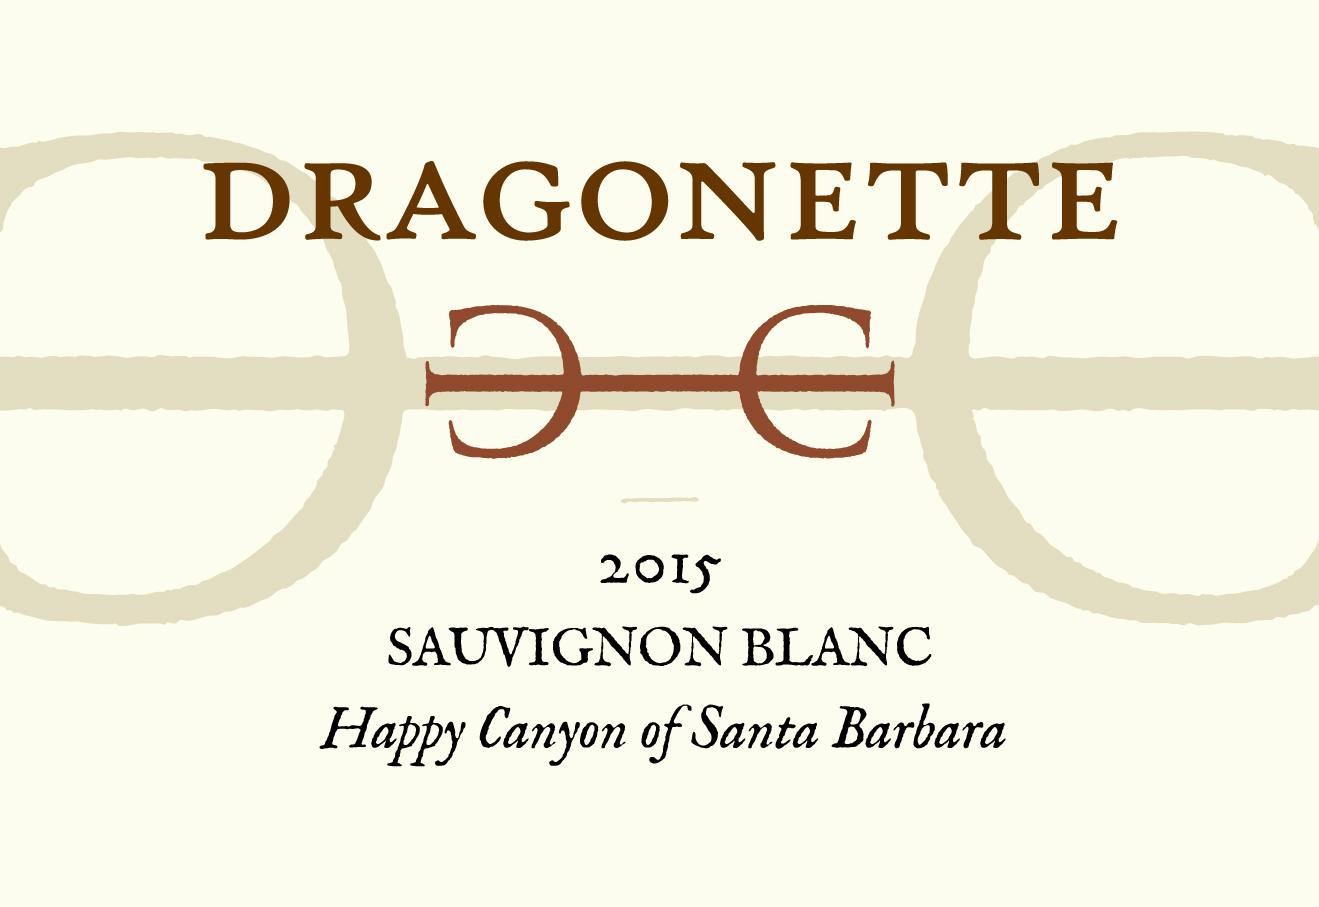 2015 Sauvignon Blanc, Happy Canyon of Santa Barbara